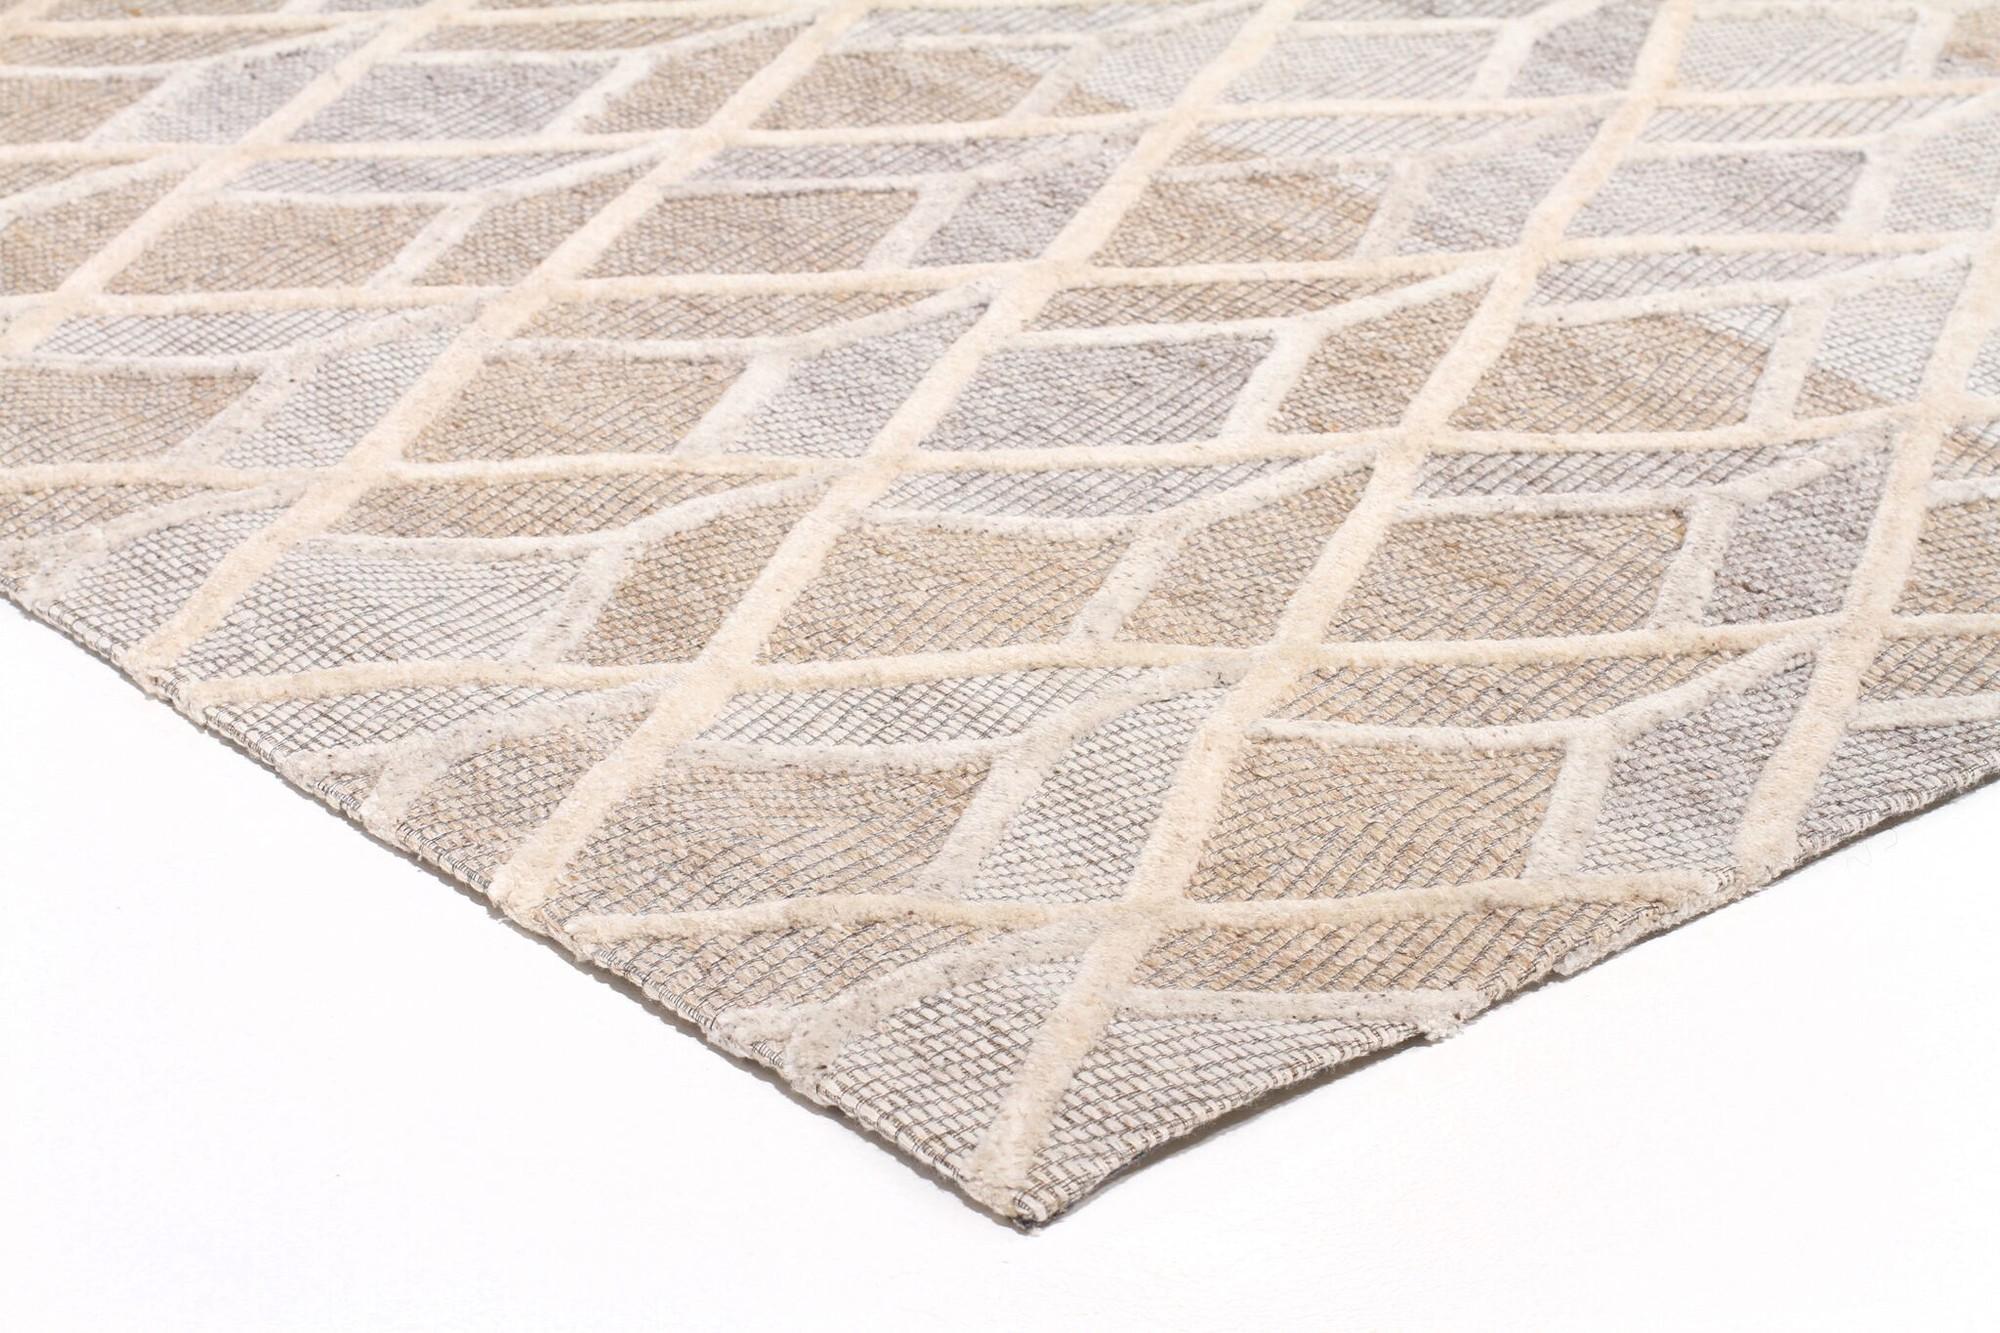 new clyde jacquard wool & viscose modern rug network rugs   ebay